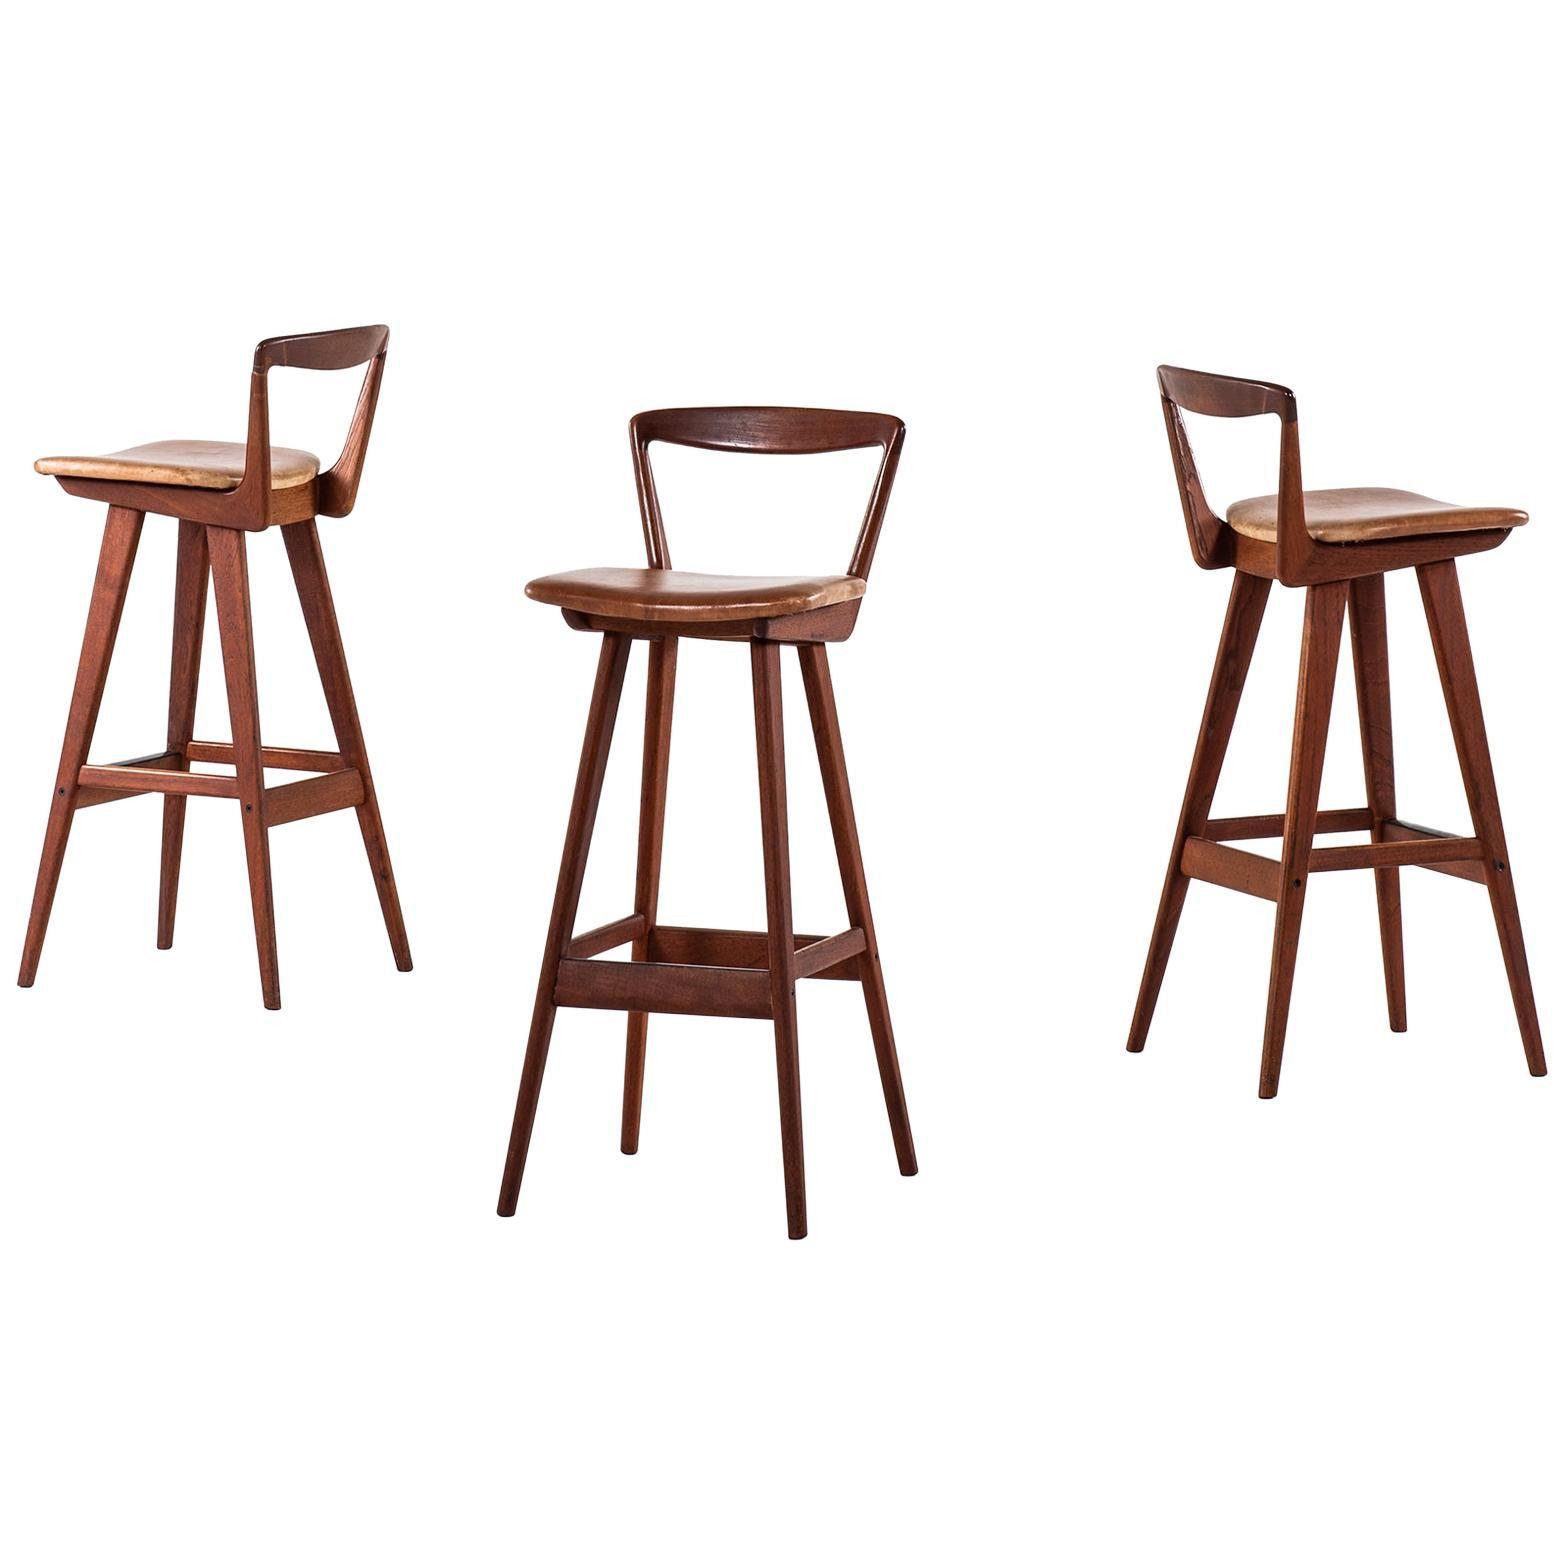 Folding Kitchen Bar Stools Designer Bar Stools Retro Bar Stools